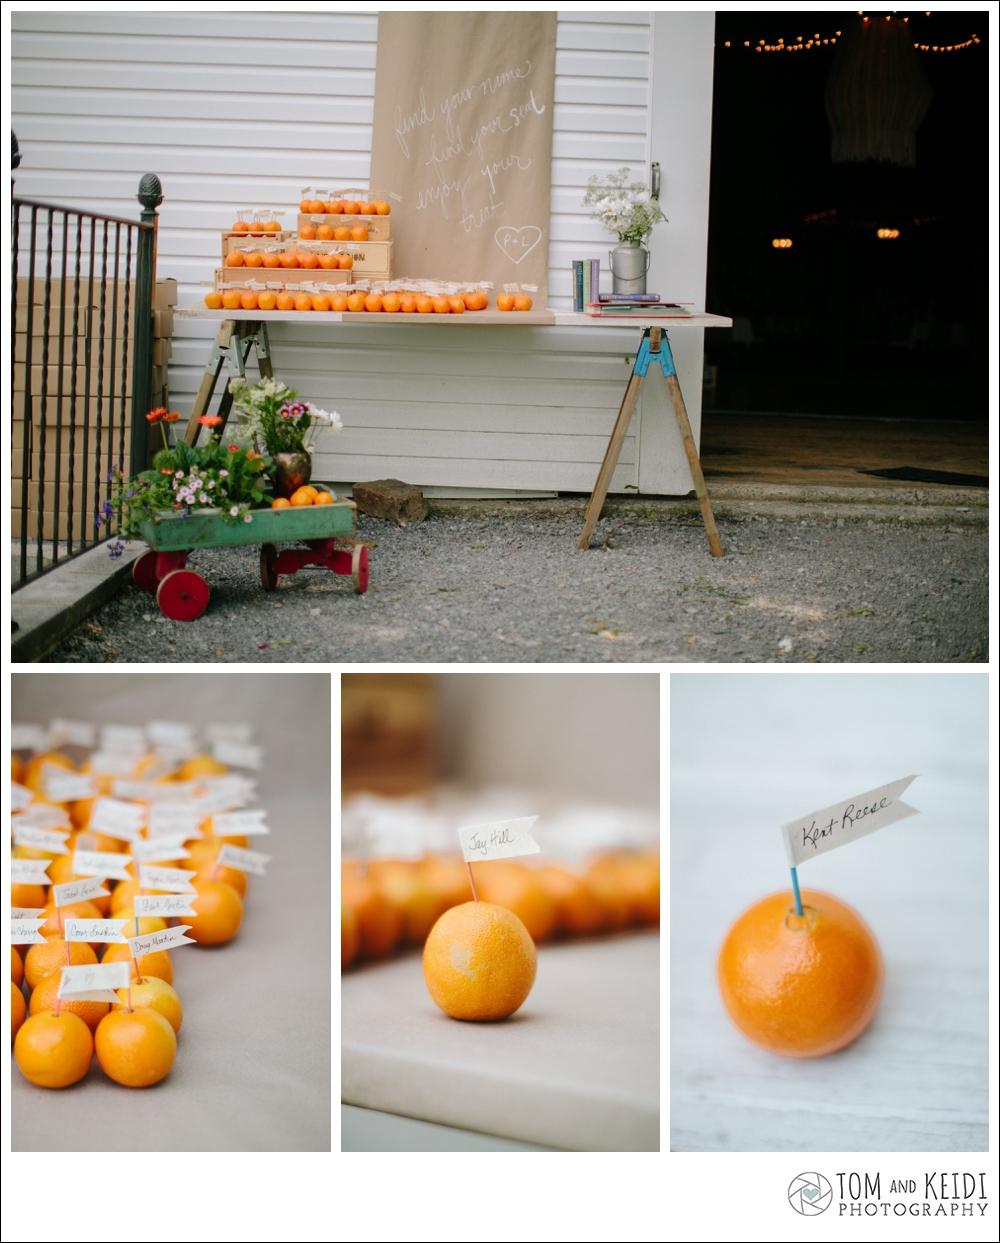 eco friendly place card ideas oranges